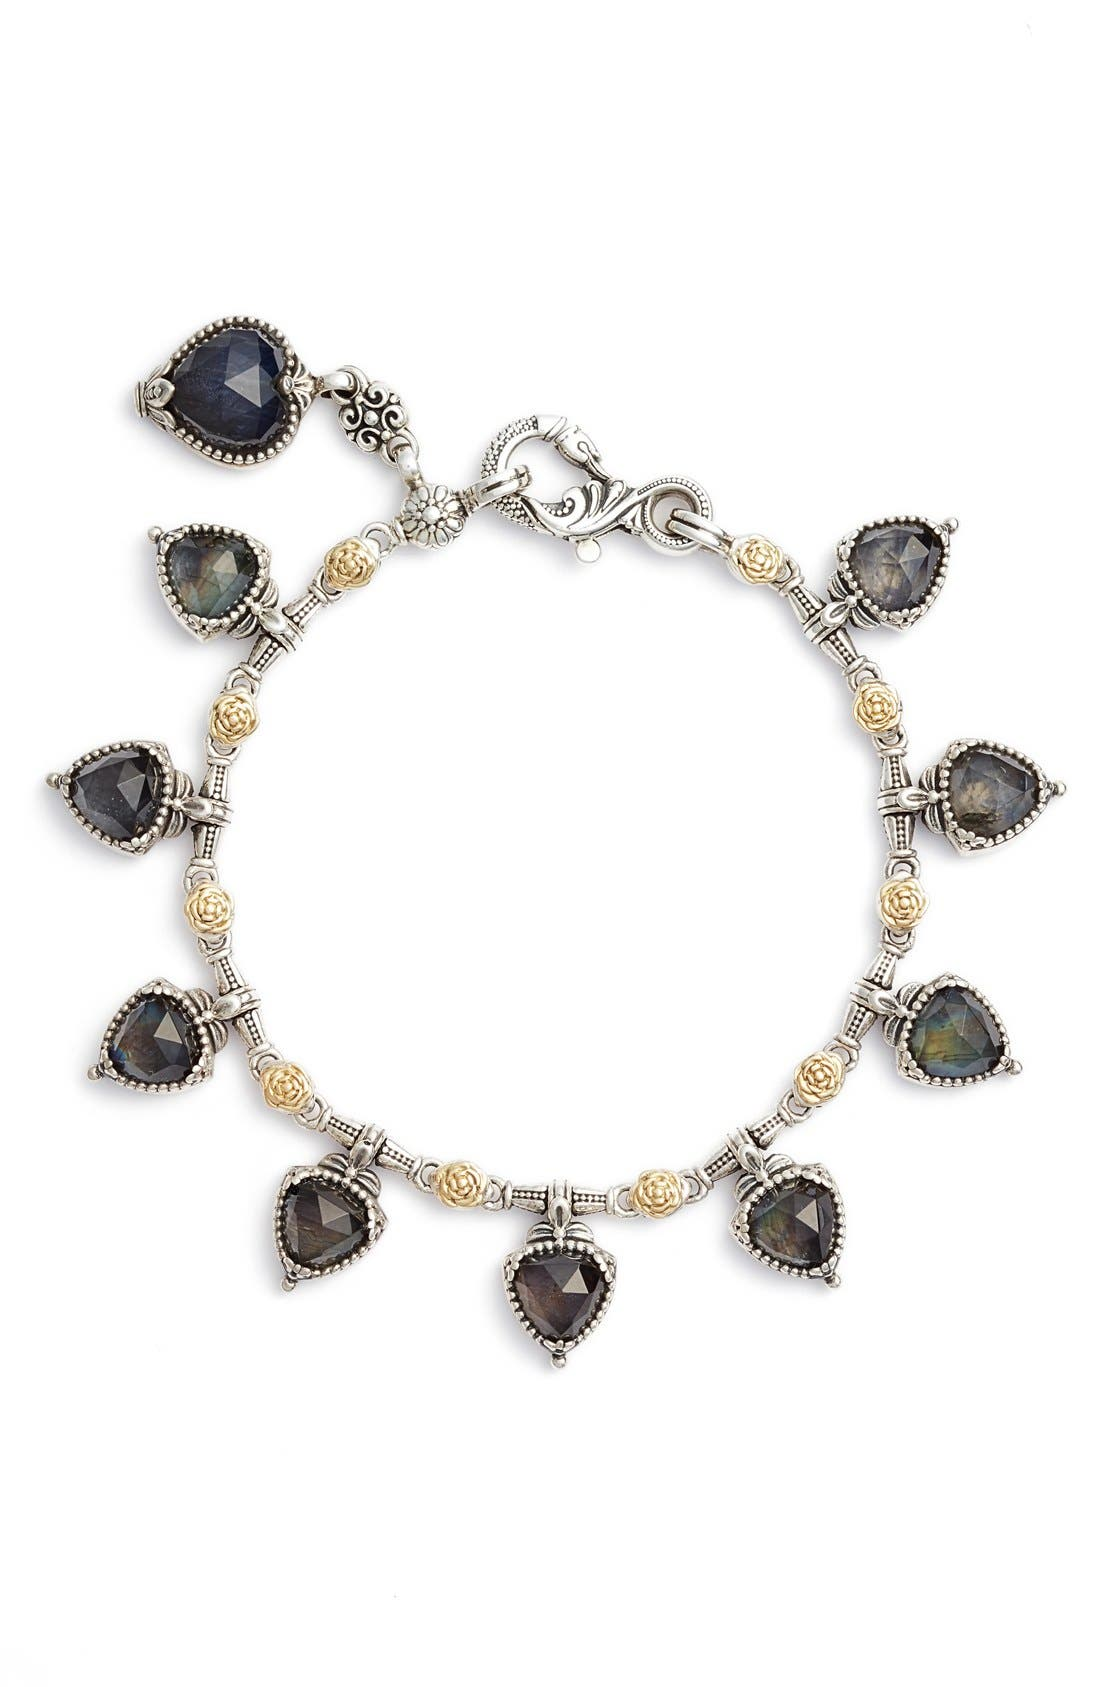 KONSTANTINO Cassiopeia Dangling Semiprecious Stone Bracelet